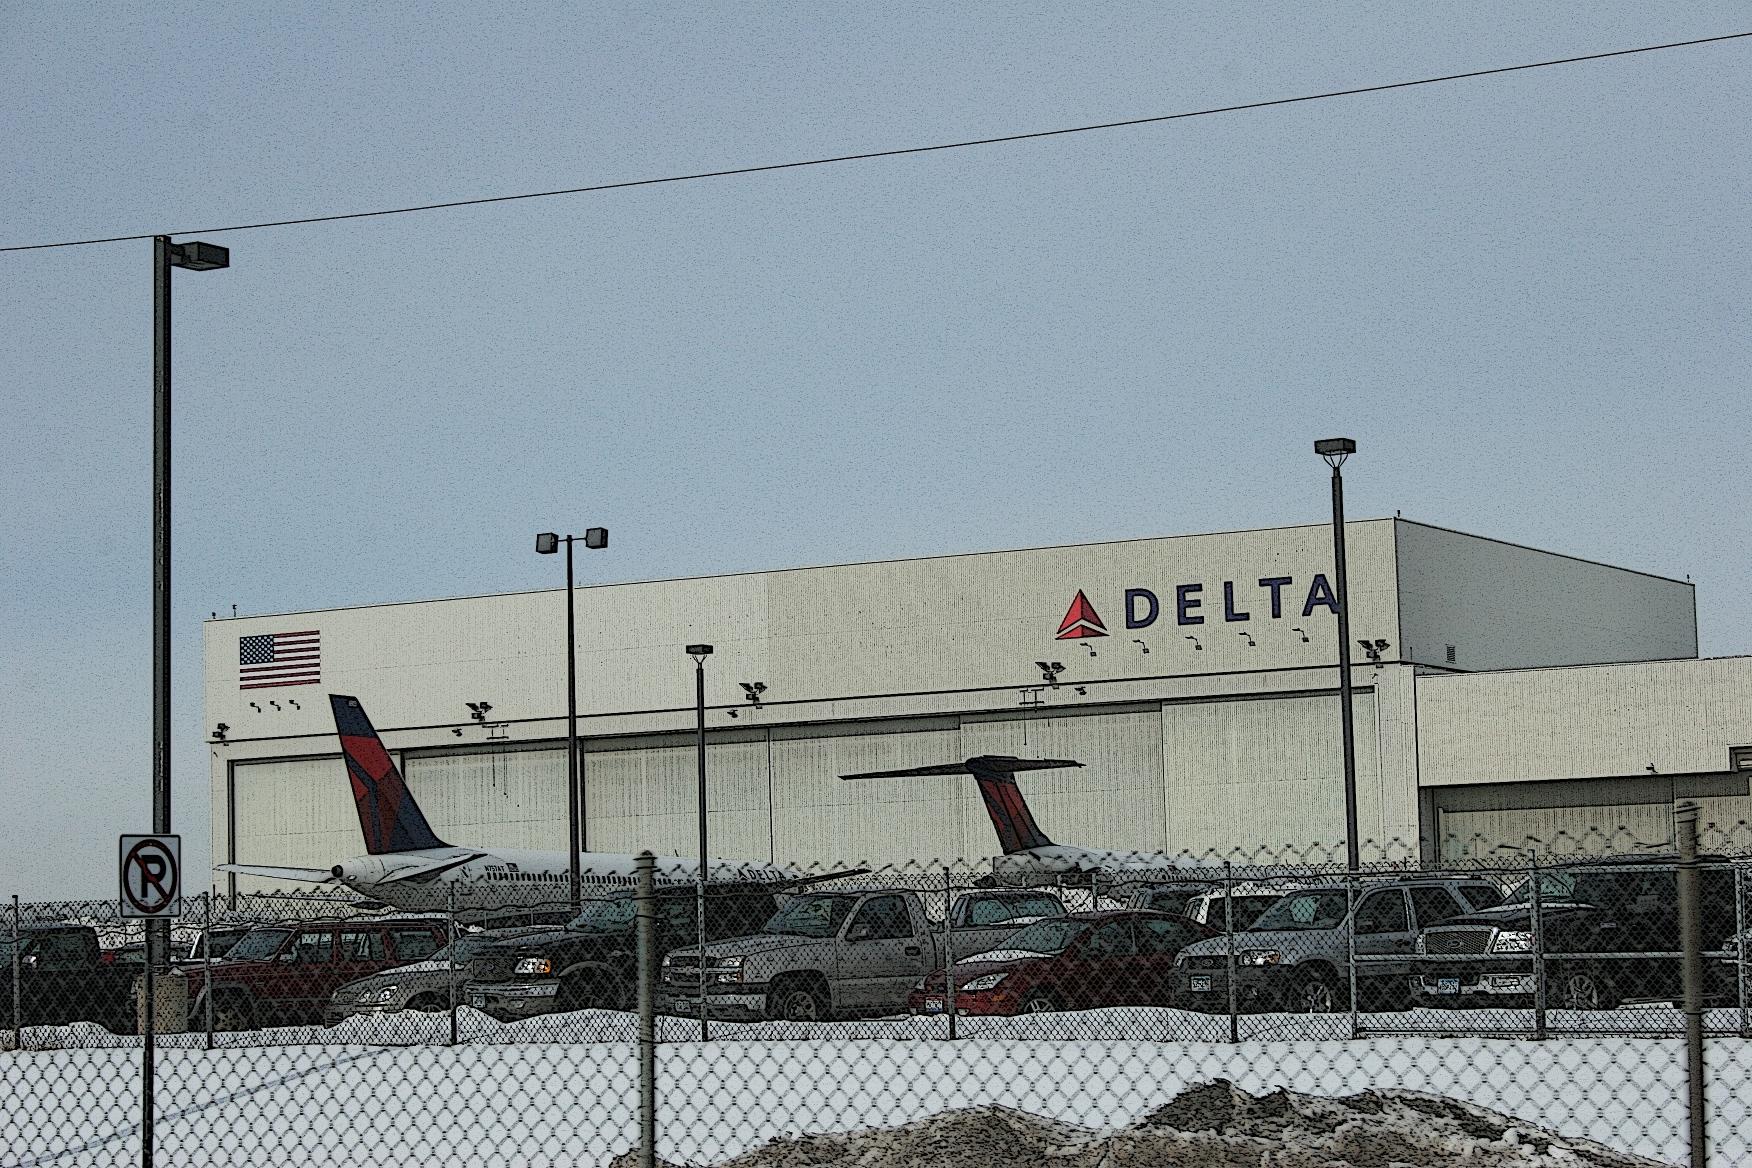 Delta planes, edited 3